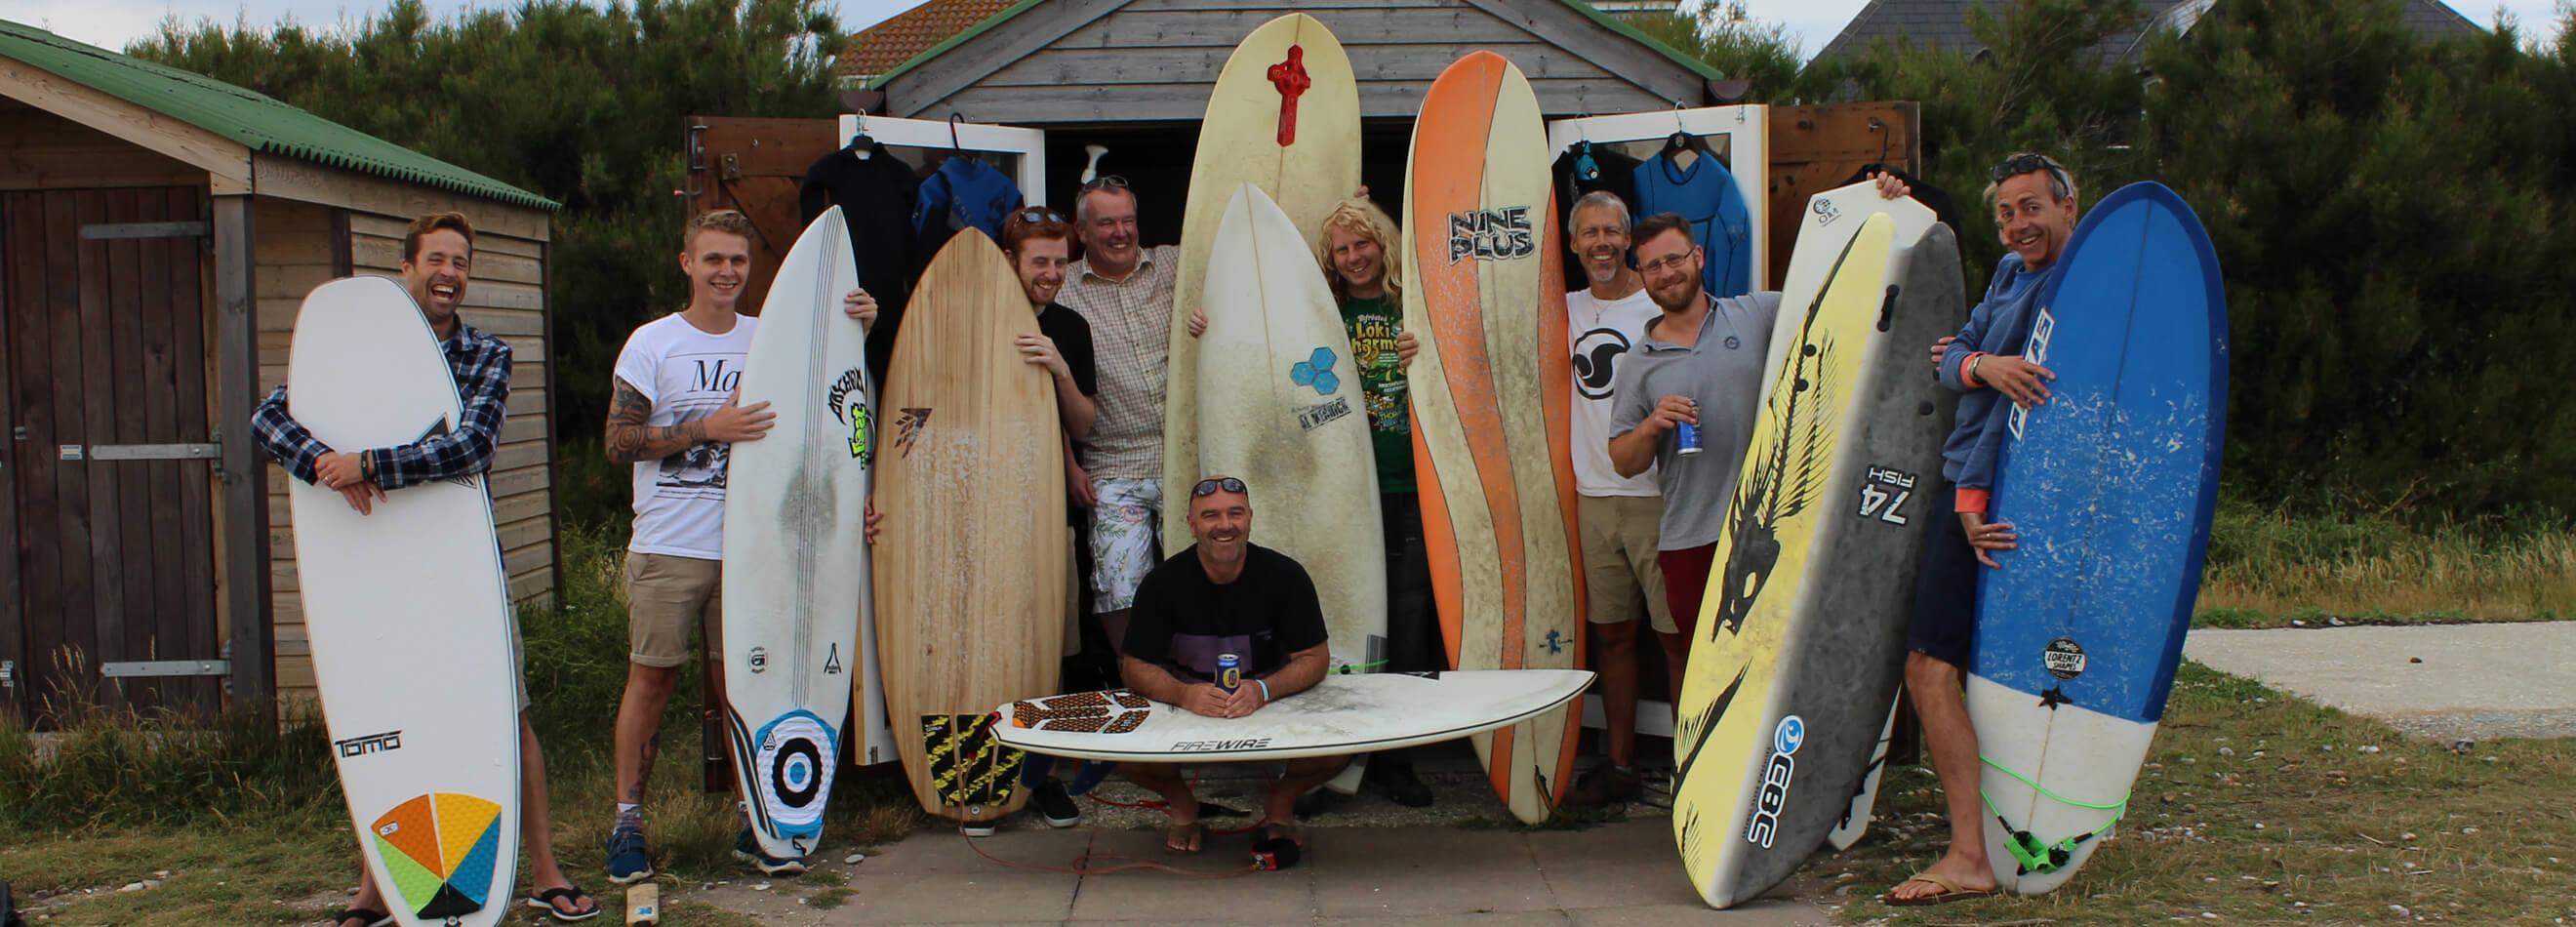 About Boardshop